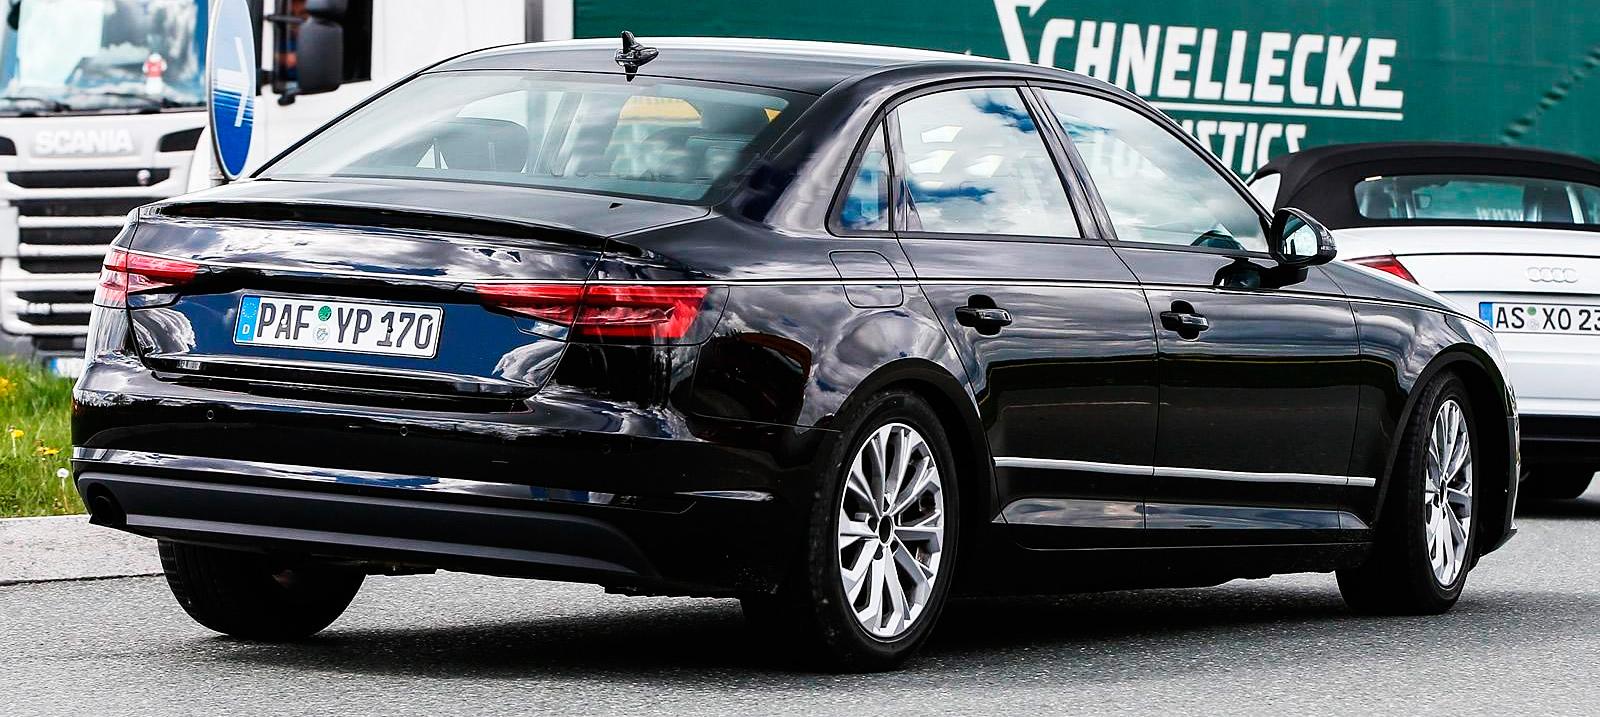 2016 Audi A4 фотографии шпионские